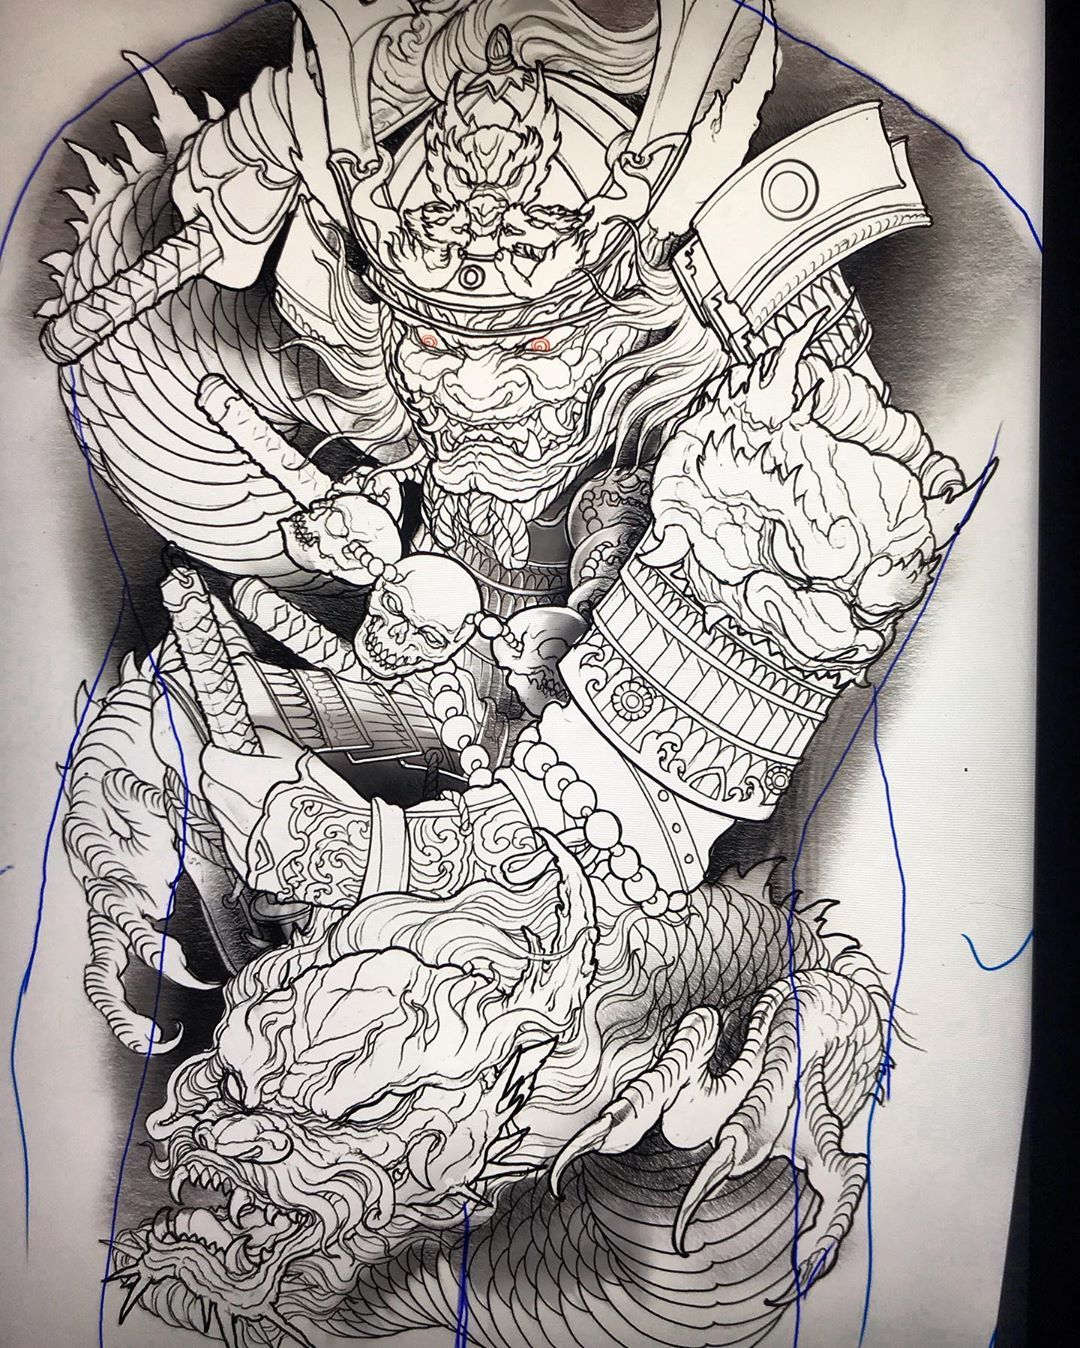 Jason kim в Instagram «samuraidragon backpiece i